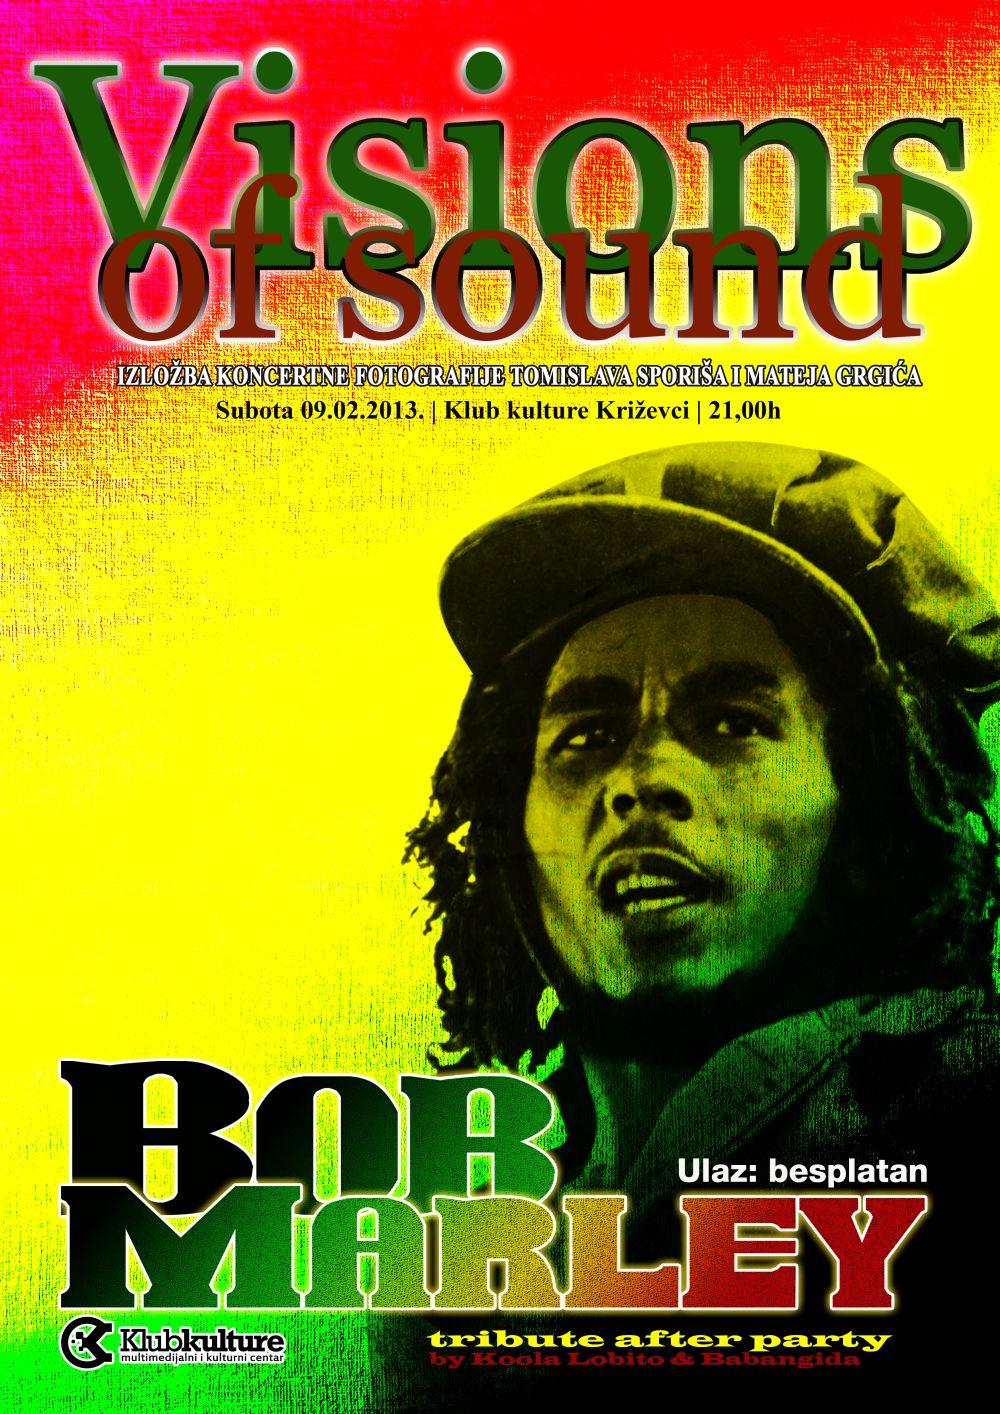 Marley tribute plakat  za net